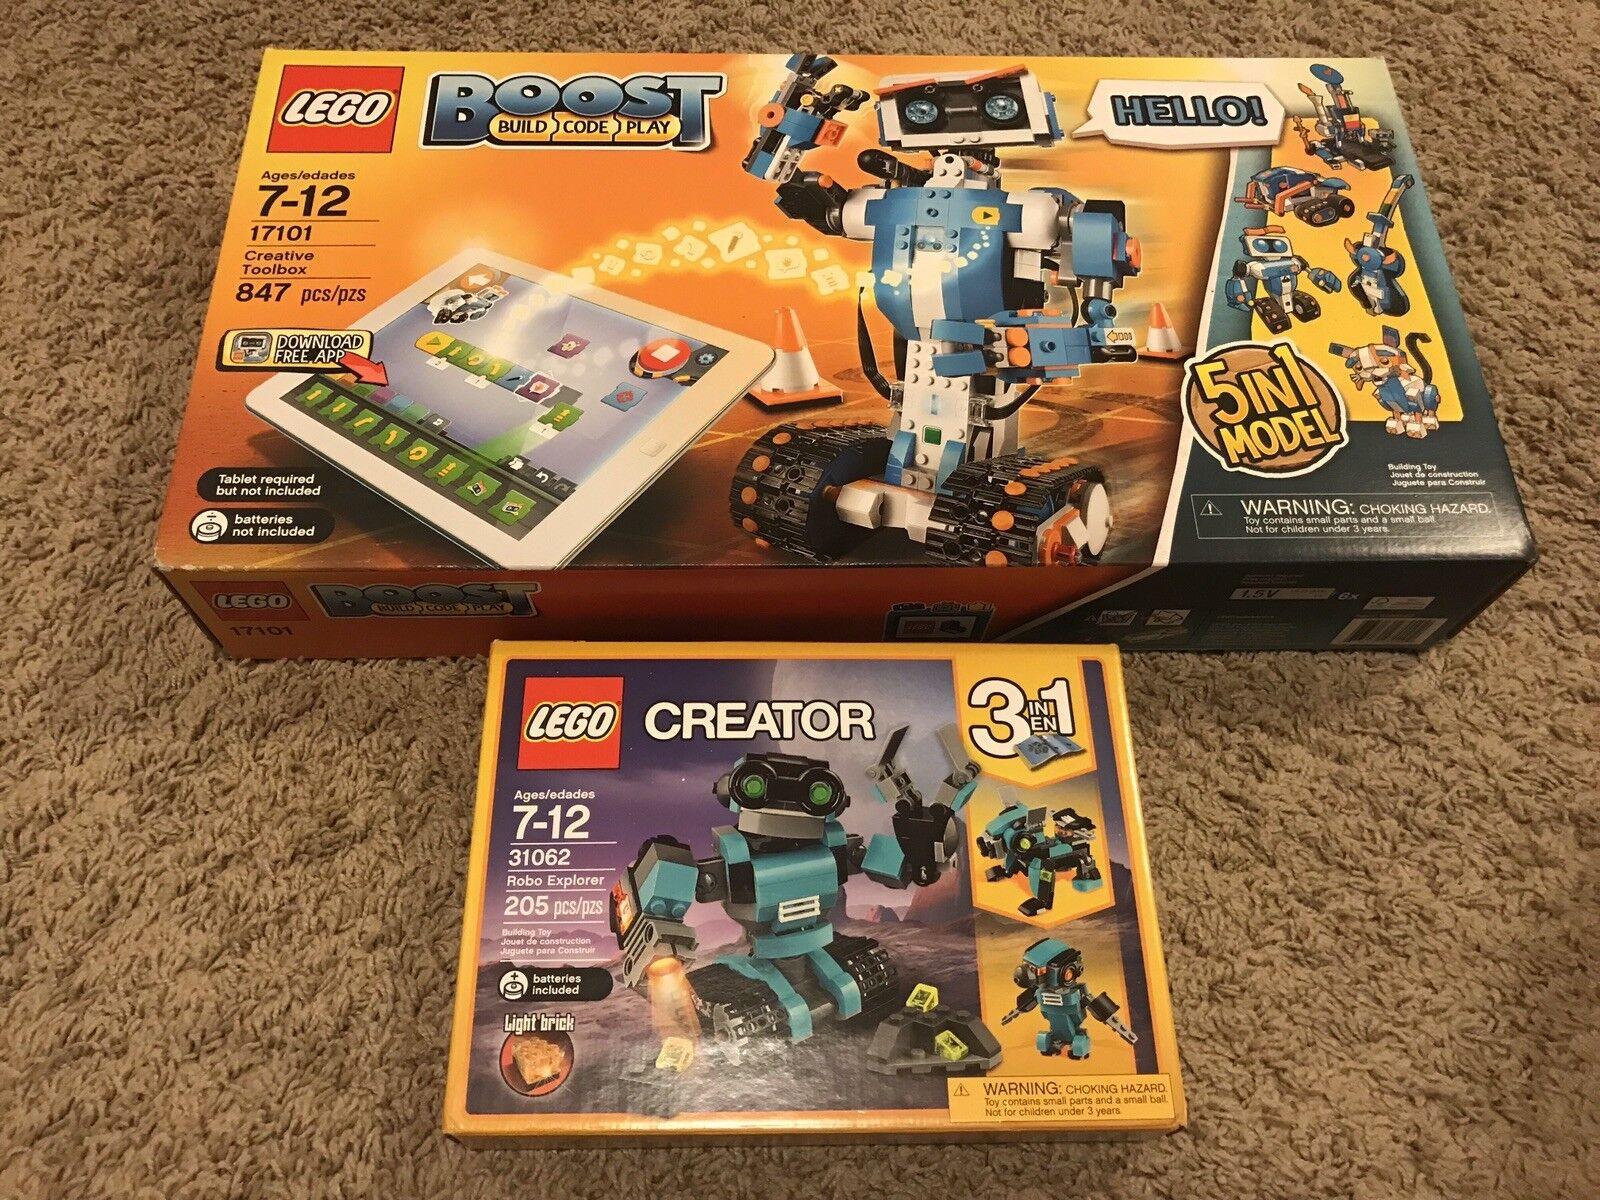 LEGO 17101 BOOST CREATIVE TOOLBOX + 31062  Creator Robot Explorer 3 in 1  se hâta de voir